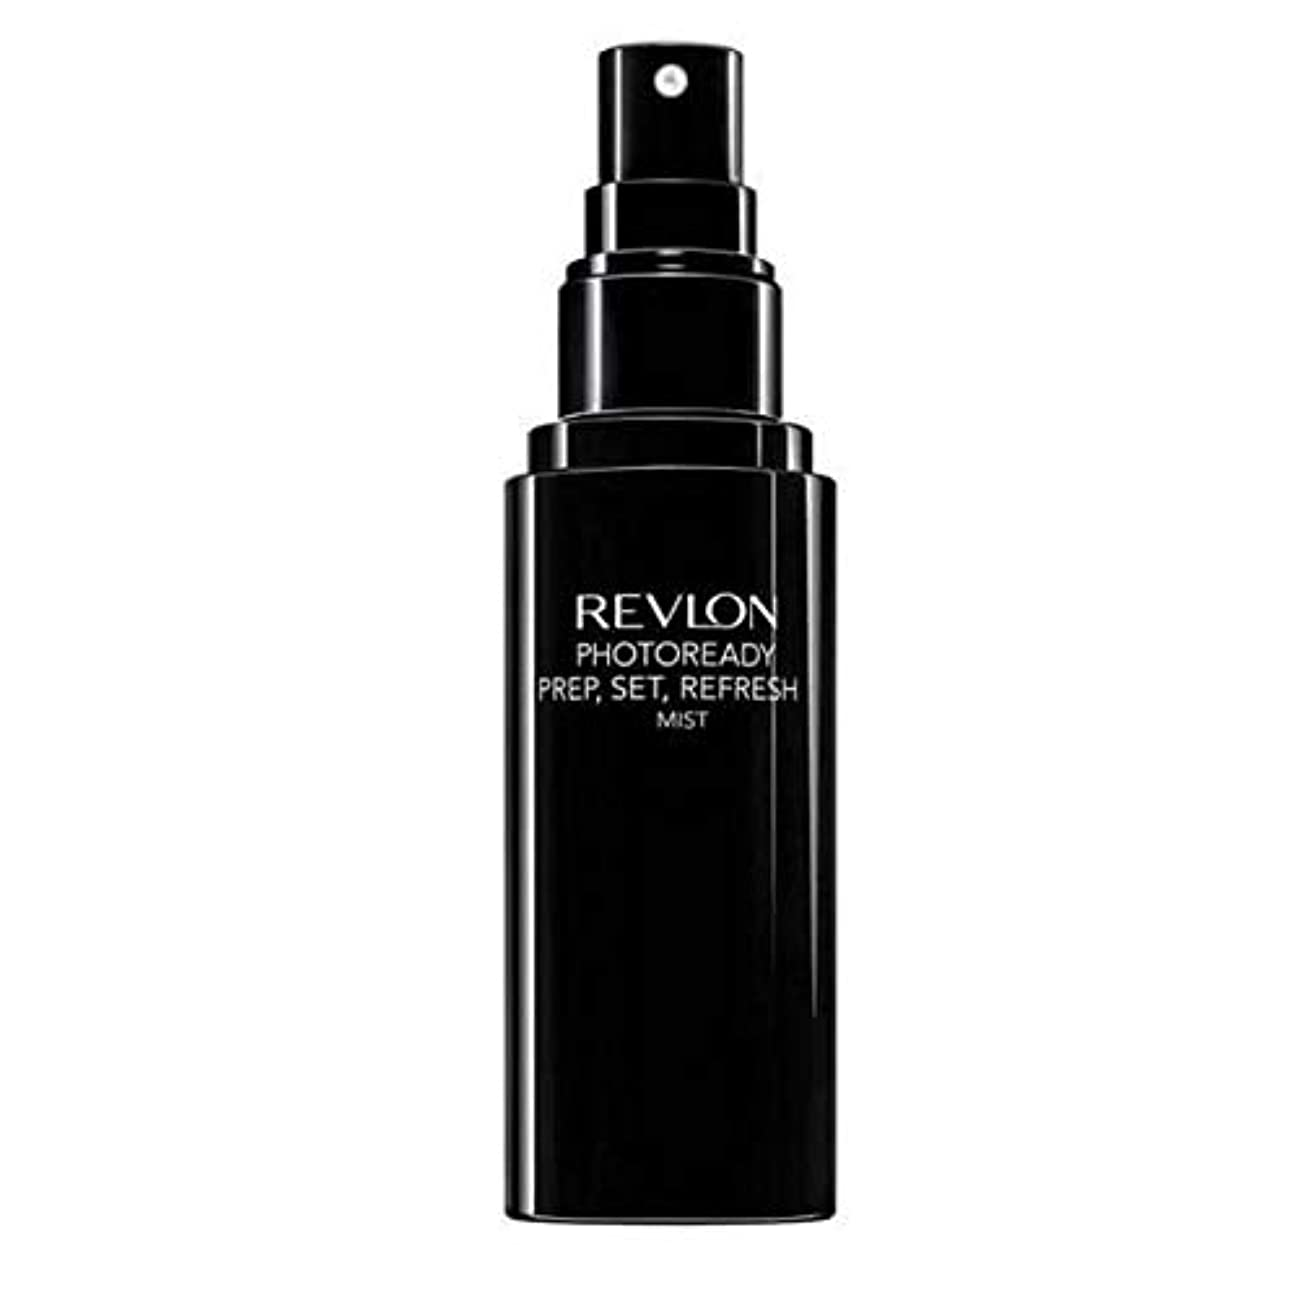 [Revlon ] レブロンPhotoready準備、セット、リフレッシュミスト - Revlon PhotoReady Prep, Set, Refresh Mist [並行輸入品]